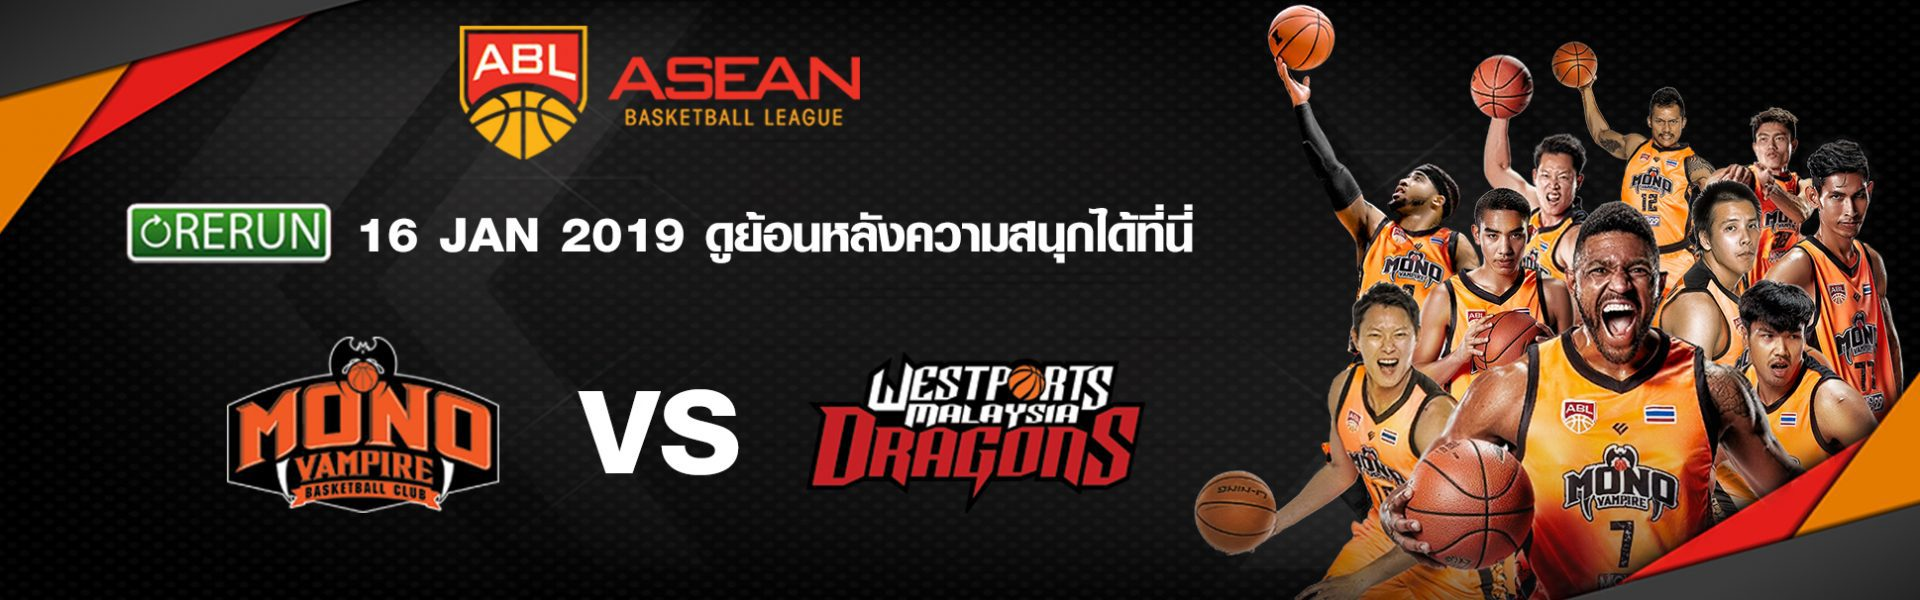 Asean Basketball League 2018-2019 : Mono Vampire VS Westports Dragons 16 Jan 2019